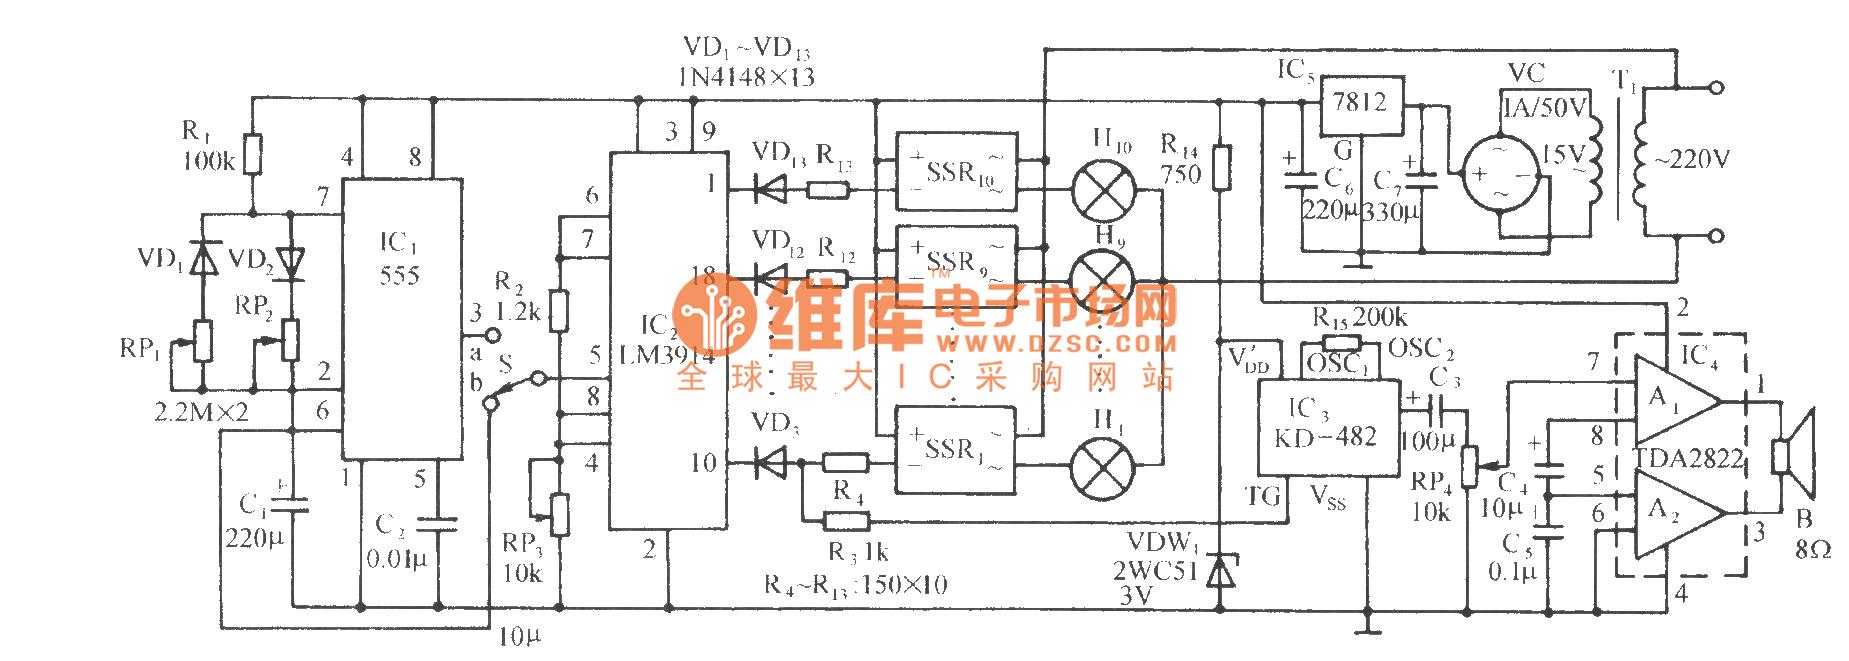 Magic Lantern Control Circuit Lm3914 Relaycontrol Controlcircuit Diagram Seekic